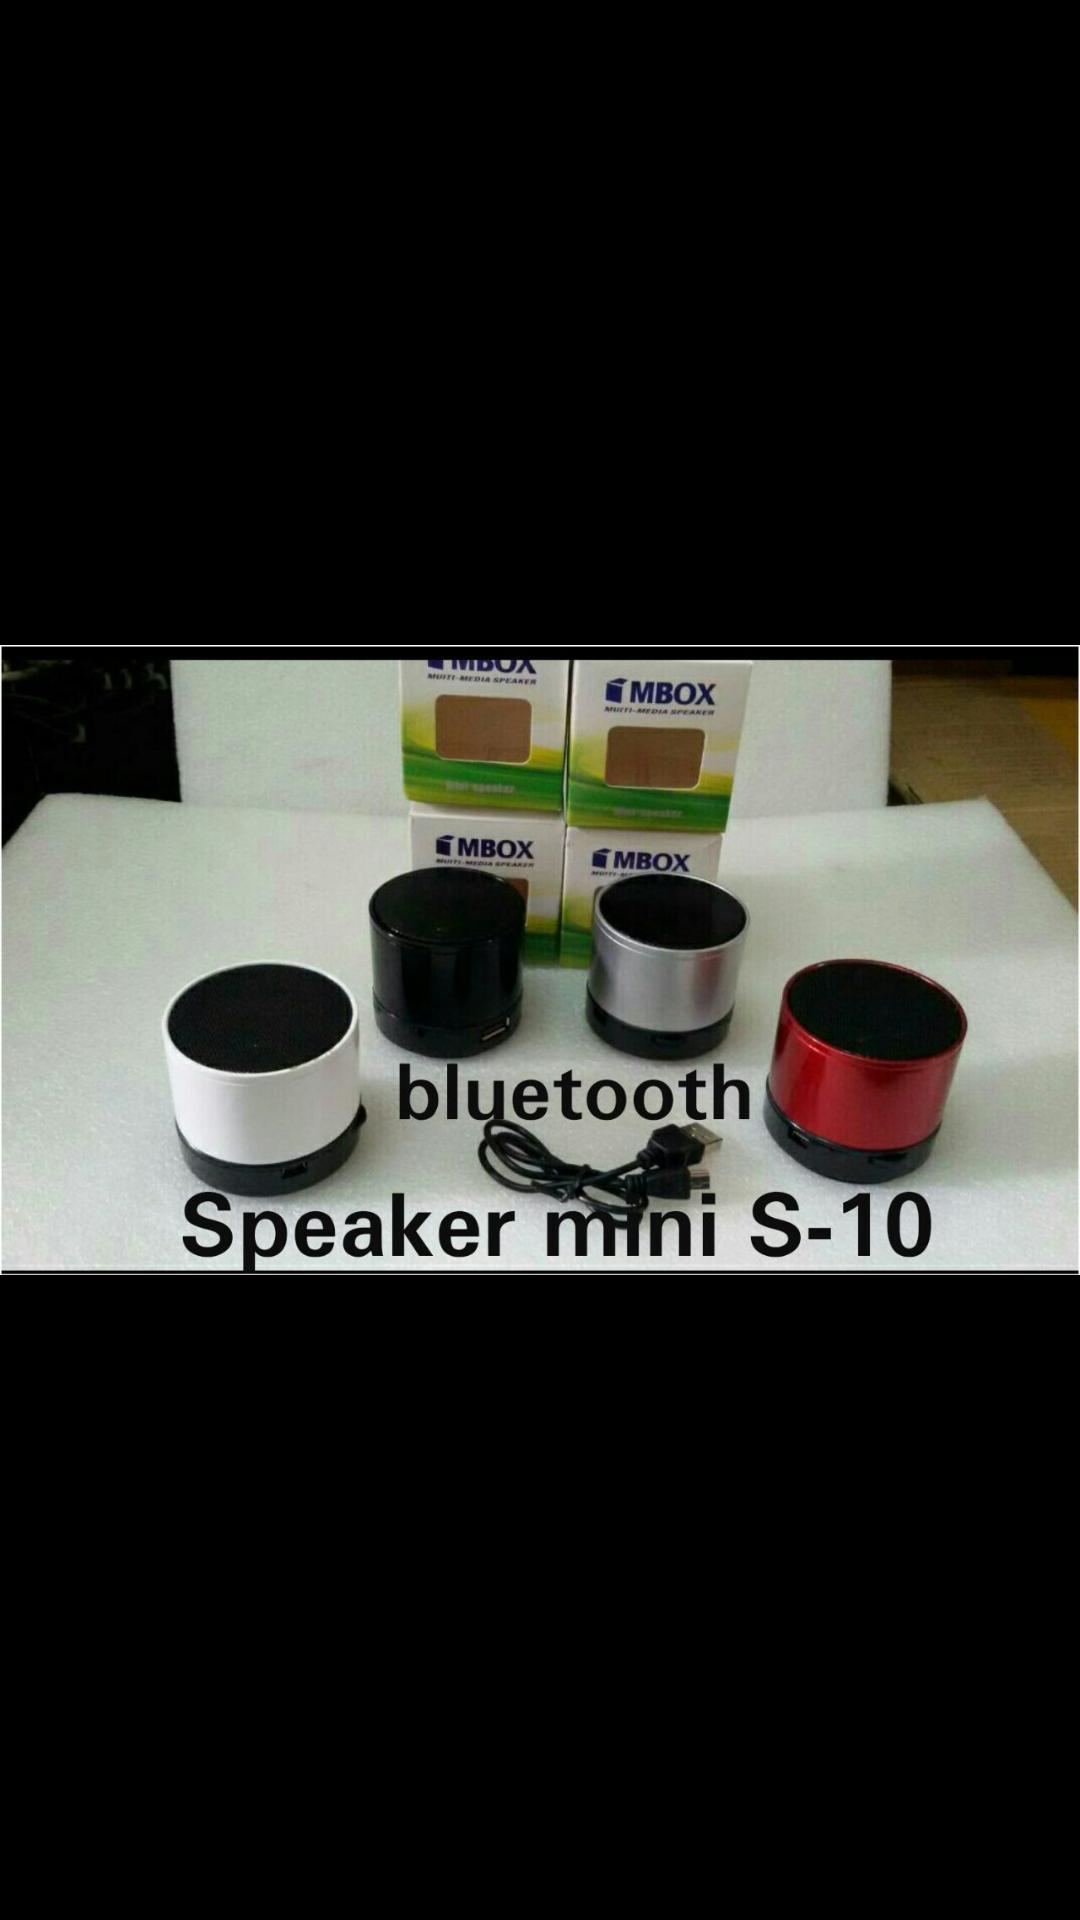 MBOX ESMILE EMG Speaker S10 mini Aktif bluetooth wireless ORIGINAL speaker bluetooth mp3 usb musik audio suara spk ZTS  BONUS ADAPTOR  spek : - Power switch off / on working - DC 5V charging